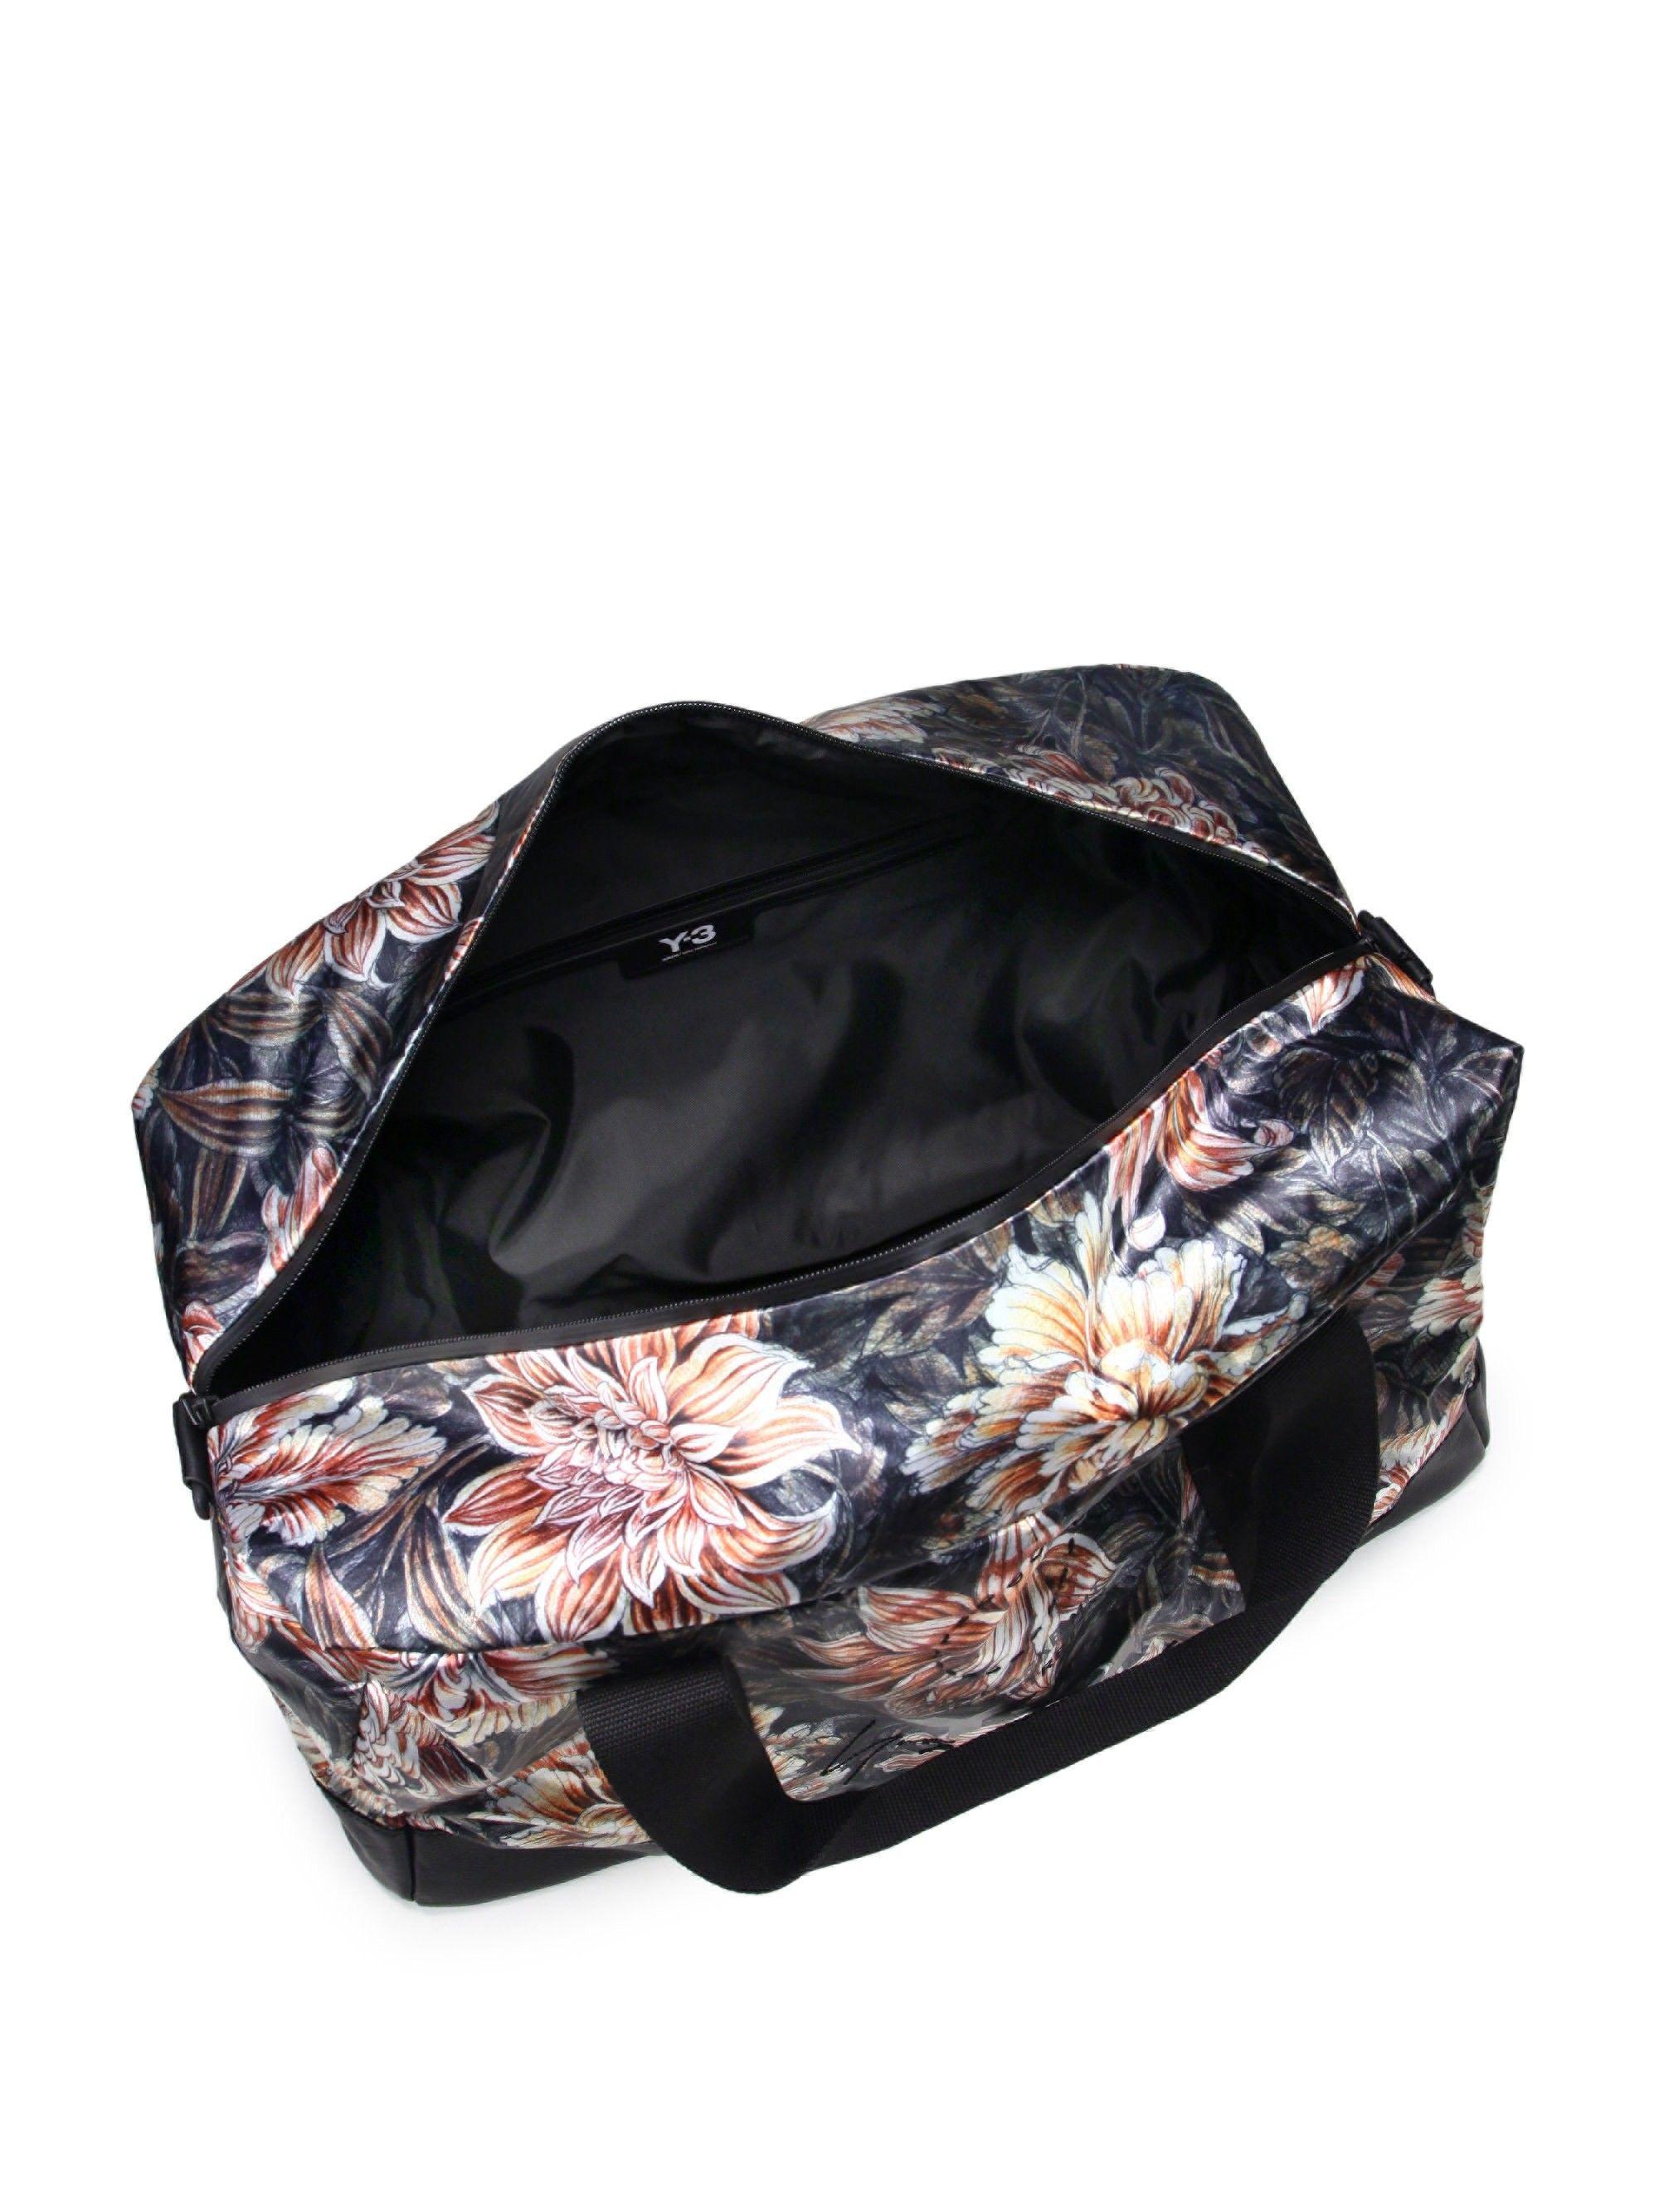 ec798531759c ... timeless design e8257 d56da Y-3 Floral-Print Weekender Duffle Bag - Aop  Apogee ...